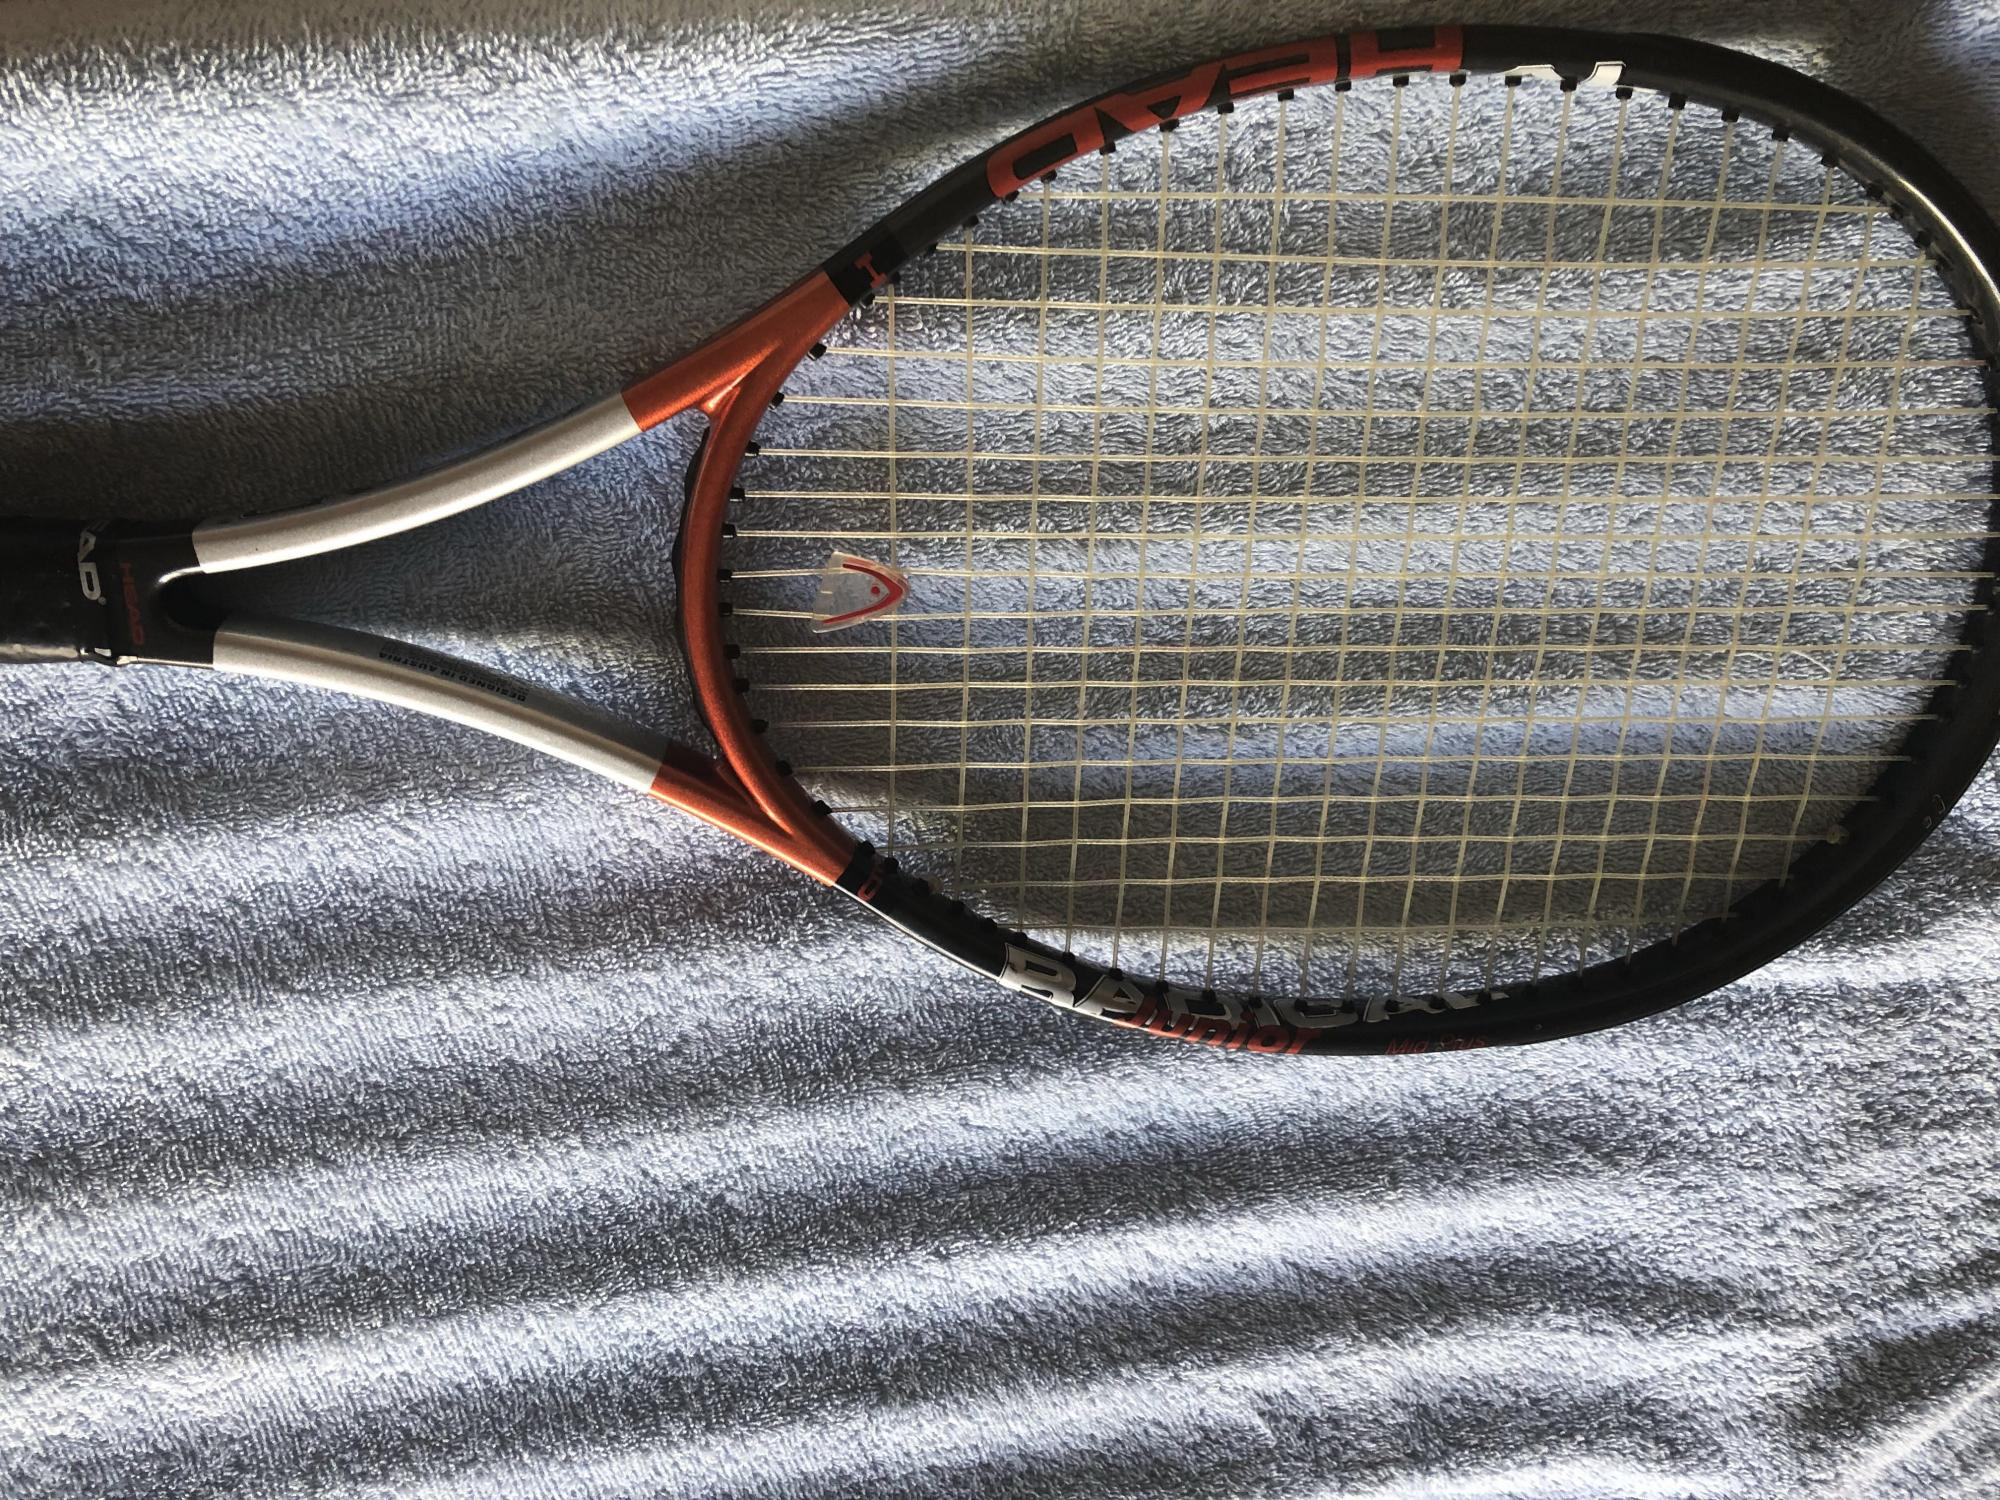 african-tennis-racket-in-pu